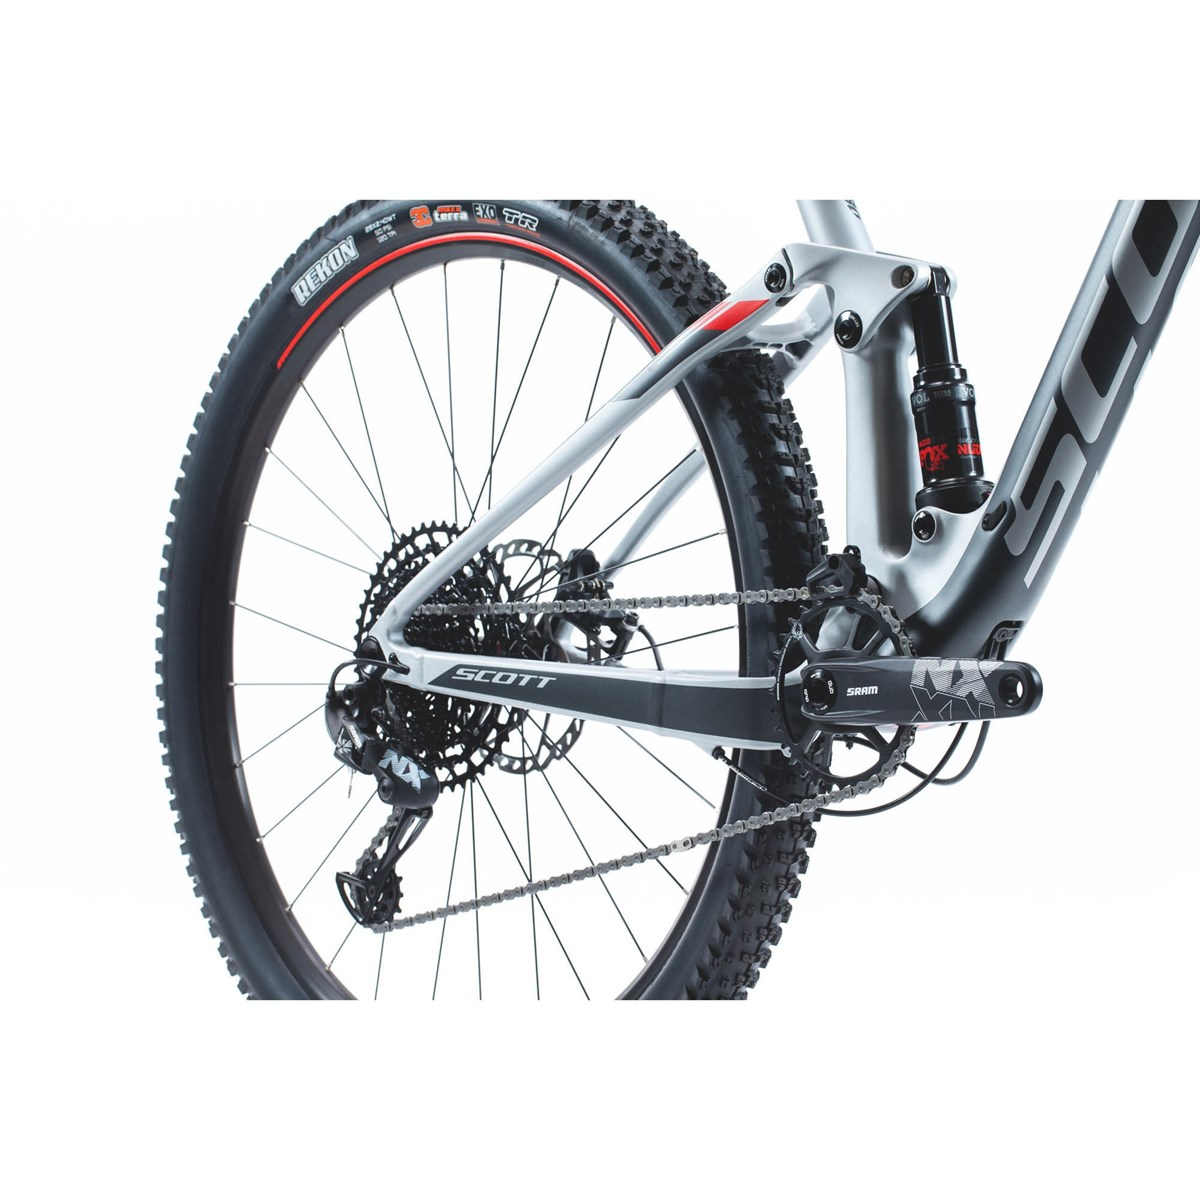 3e4e028568a 2019 Scott Spark 930 Full Suspension Mountain Bike £2,799.20